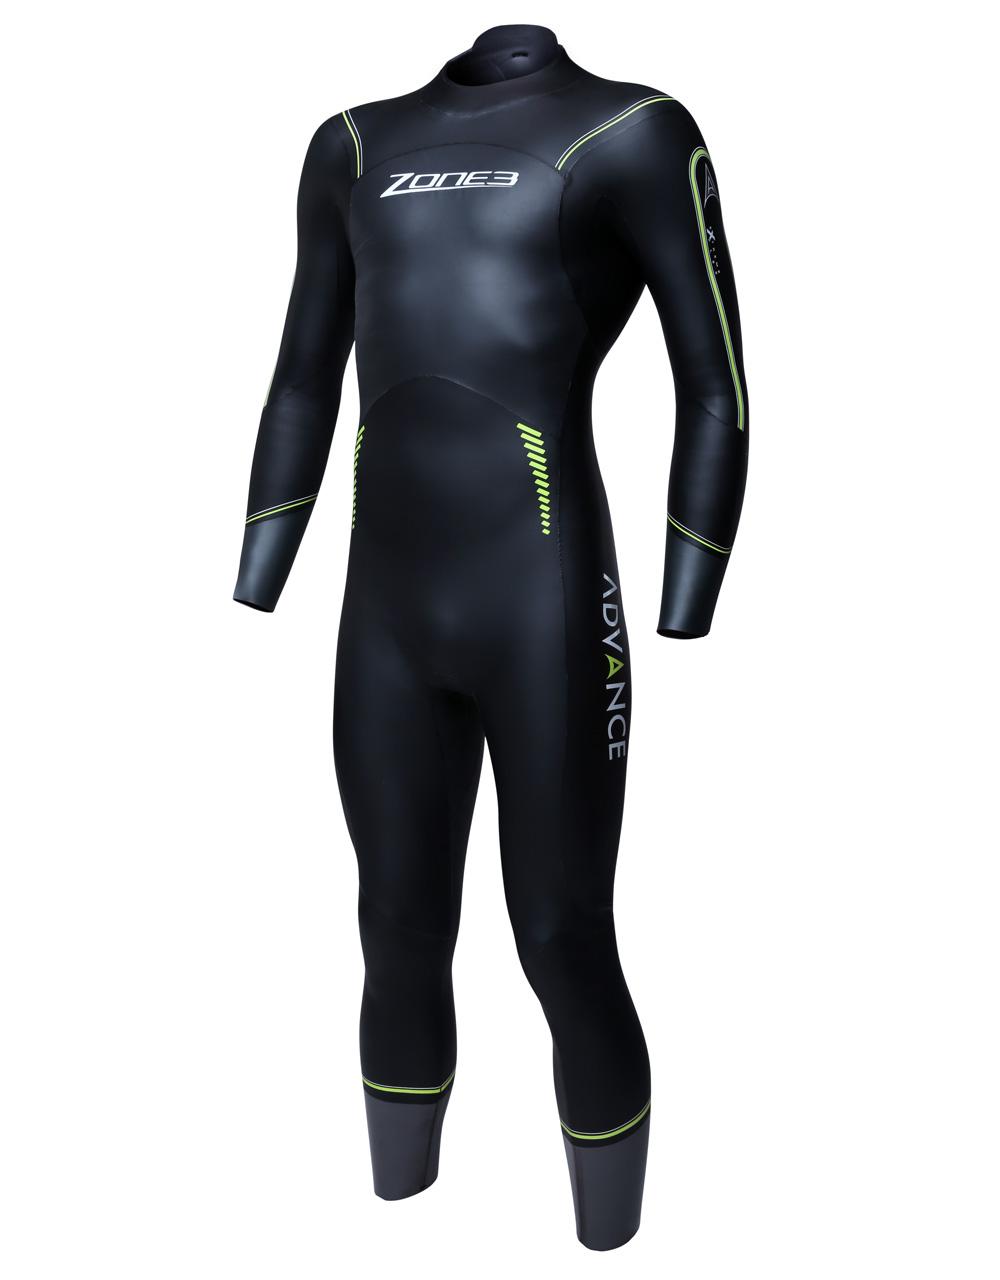 Men's Triathlon Wetsuit Carbon, Triathlon wetsuits - Arena